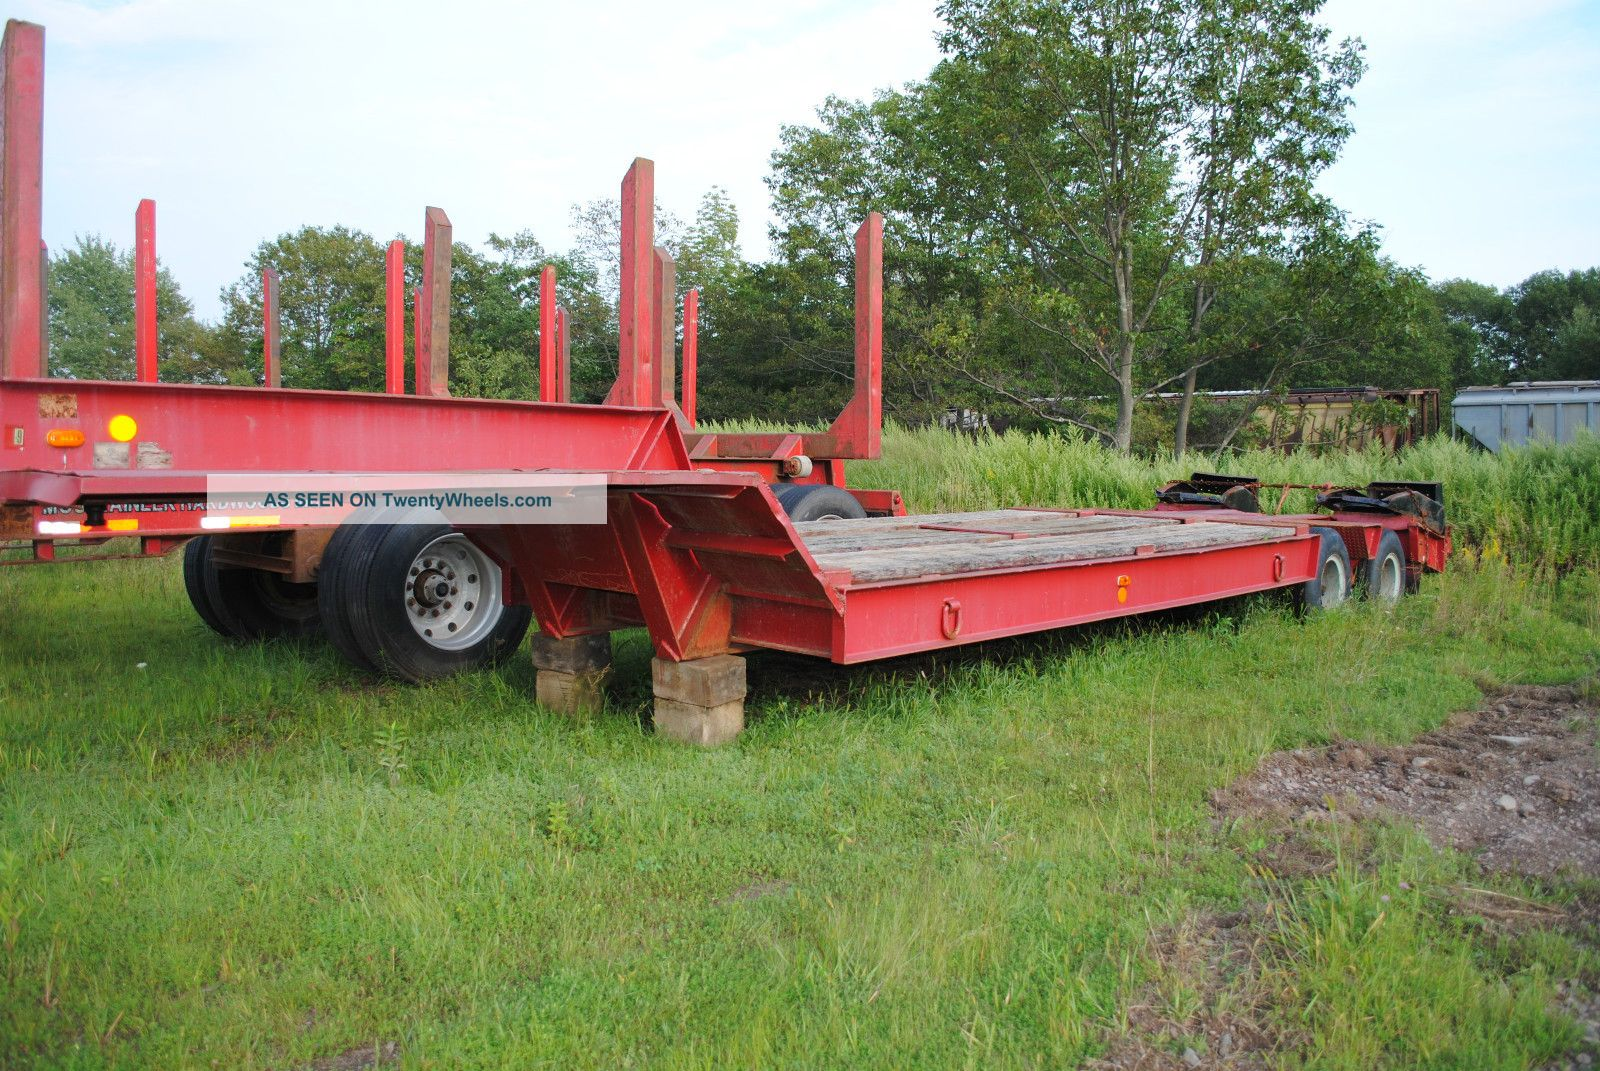 Heavy Equipment Trailer : Rogers ton heavy equipment lowboy trailer